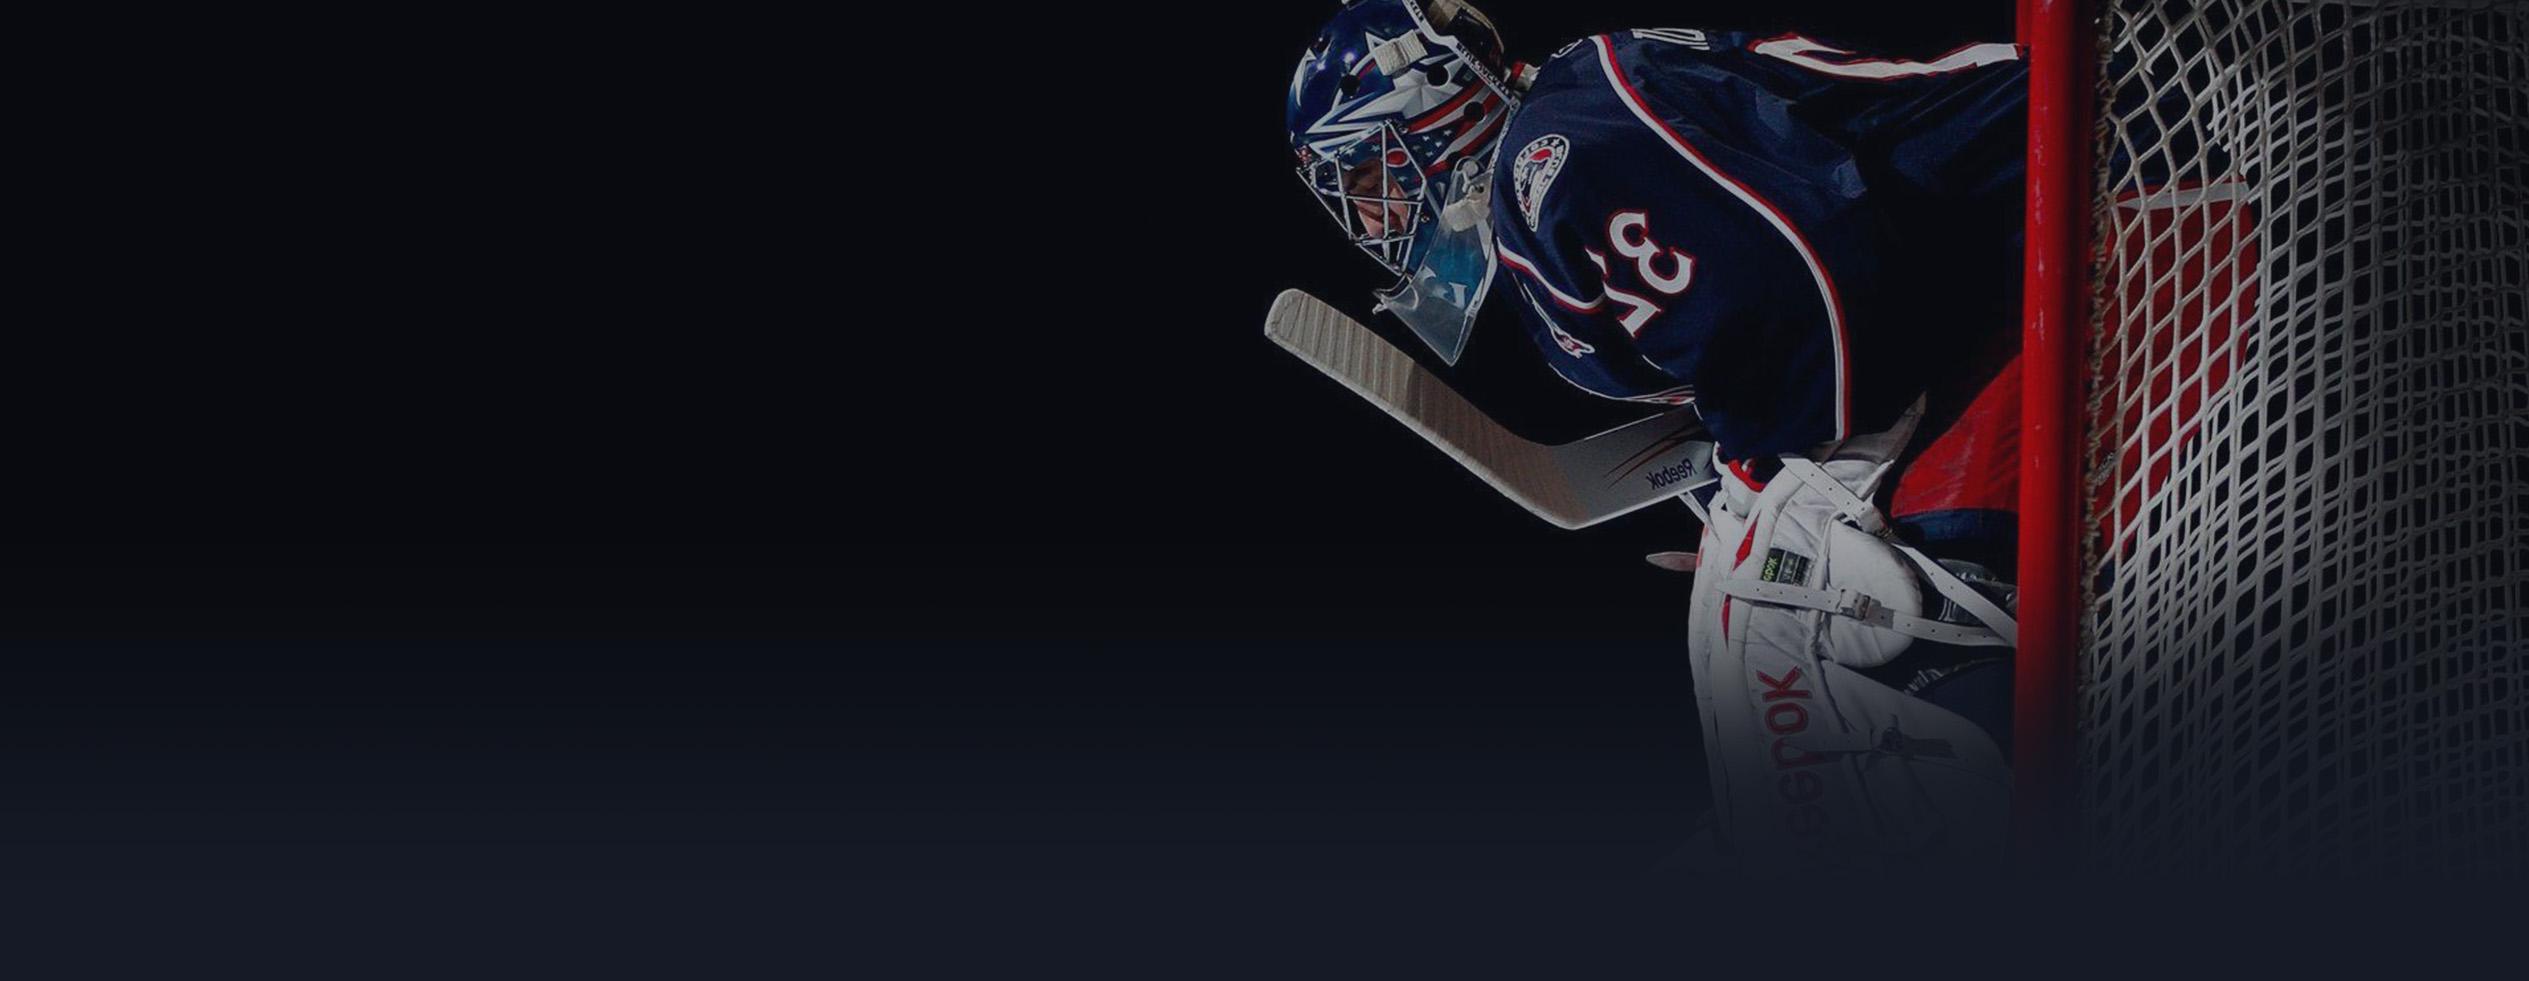 hokej-slide